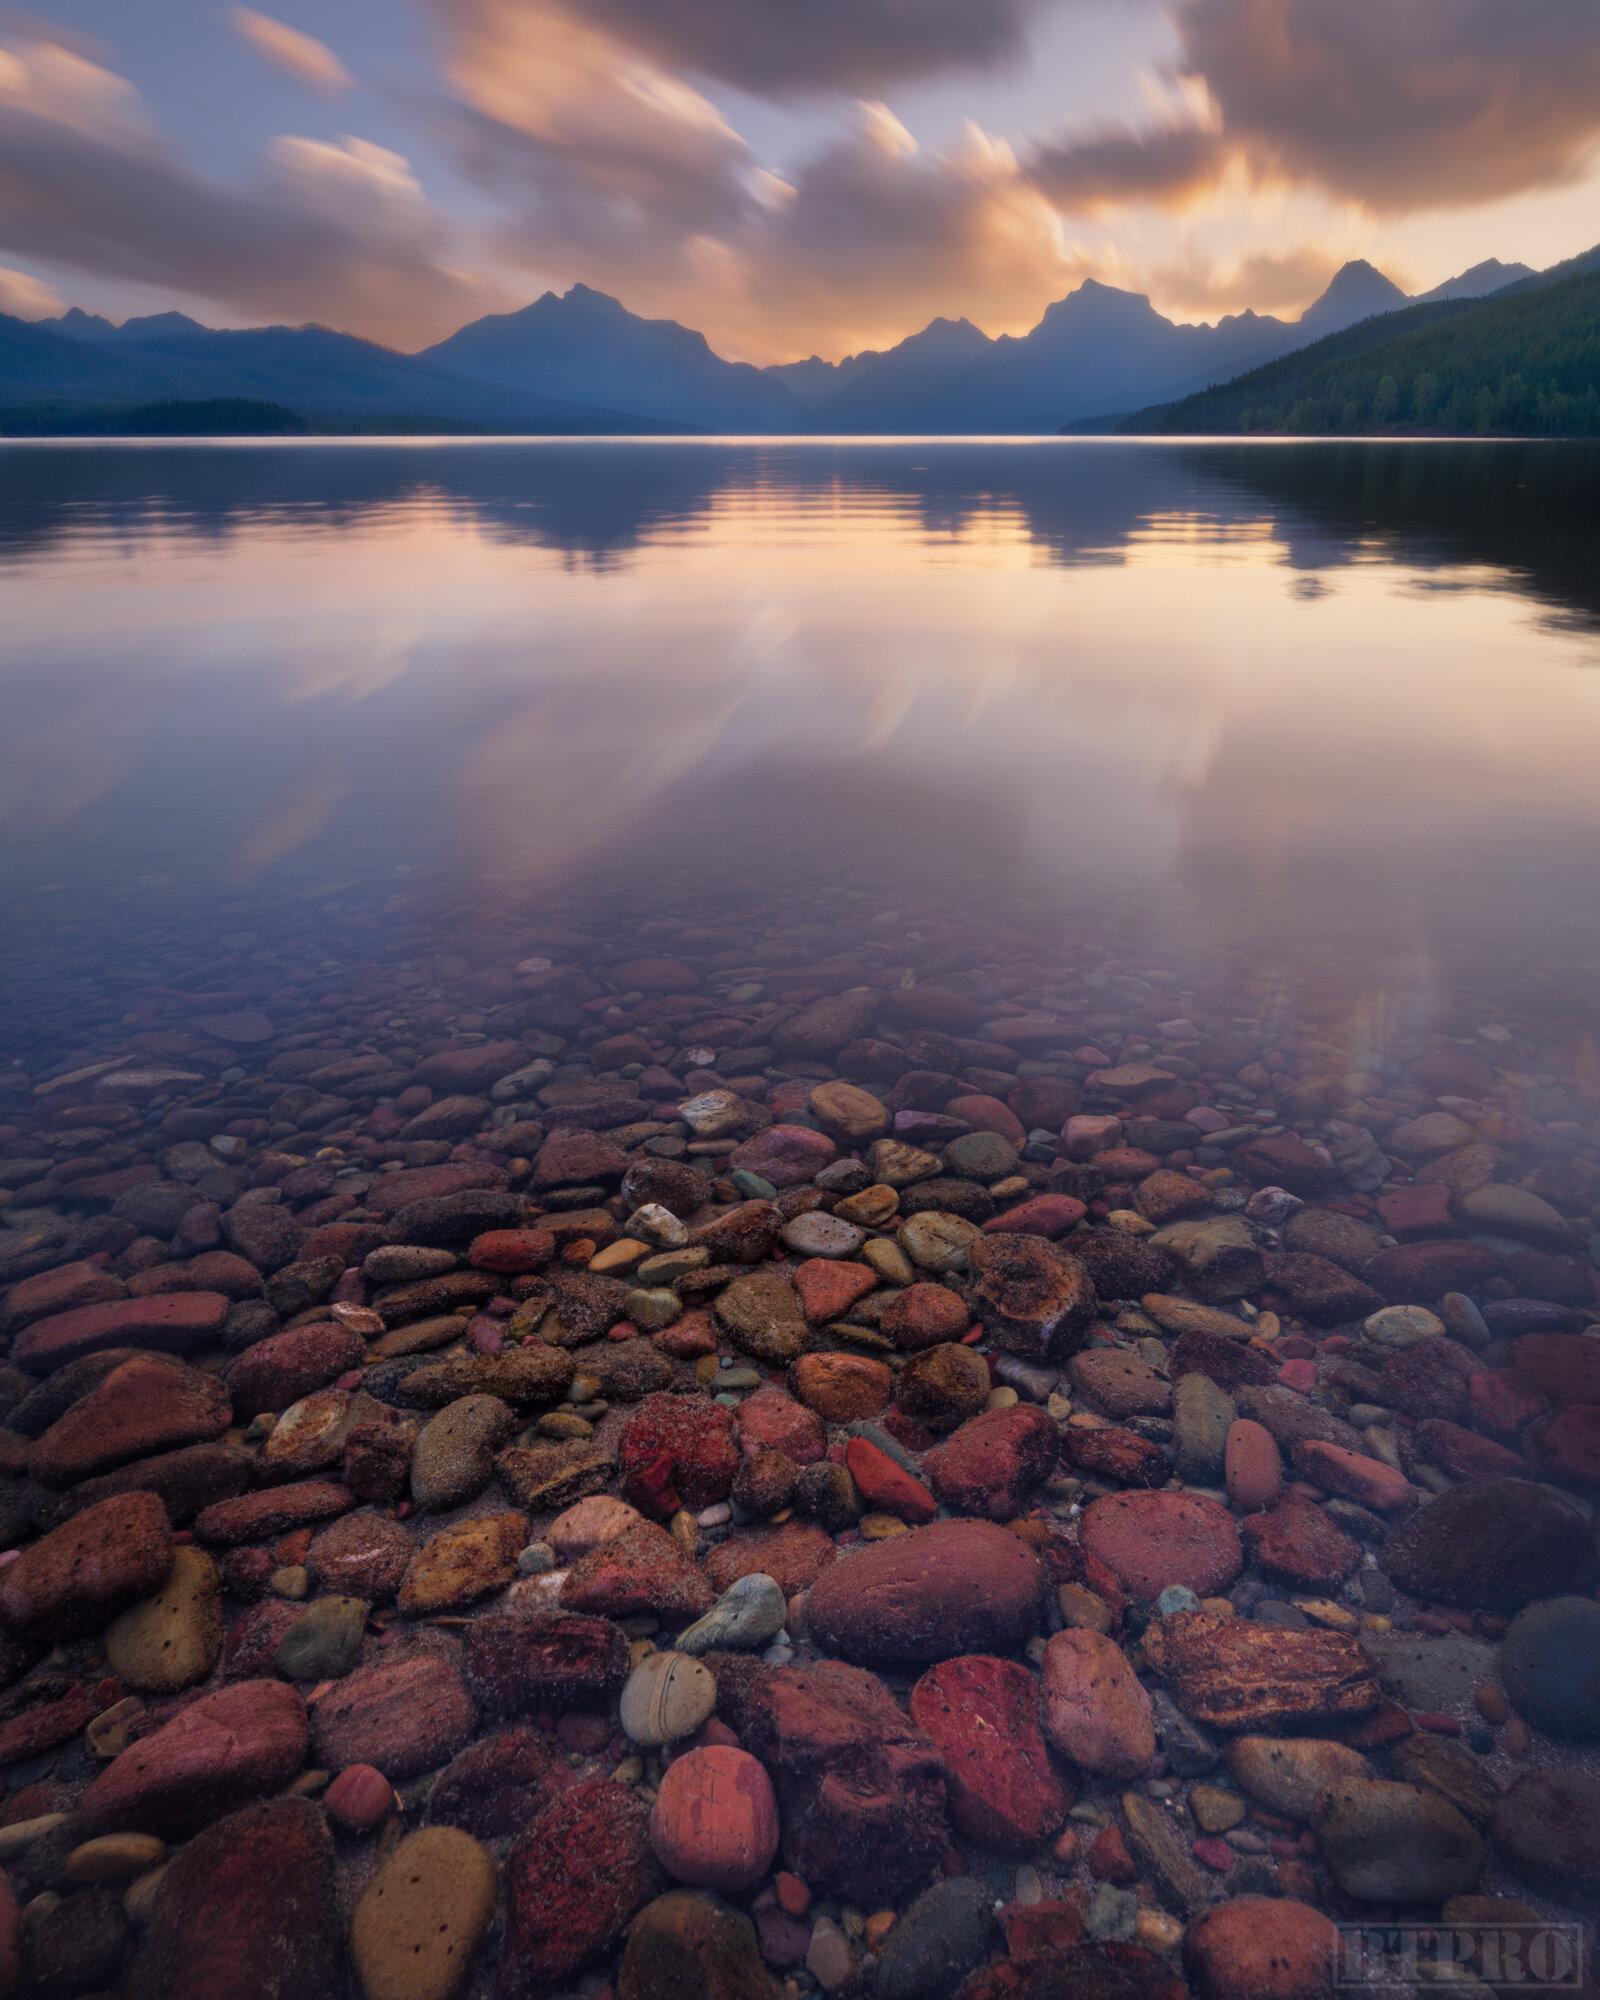 Fruity Pebbles Comp at Lake McDonald